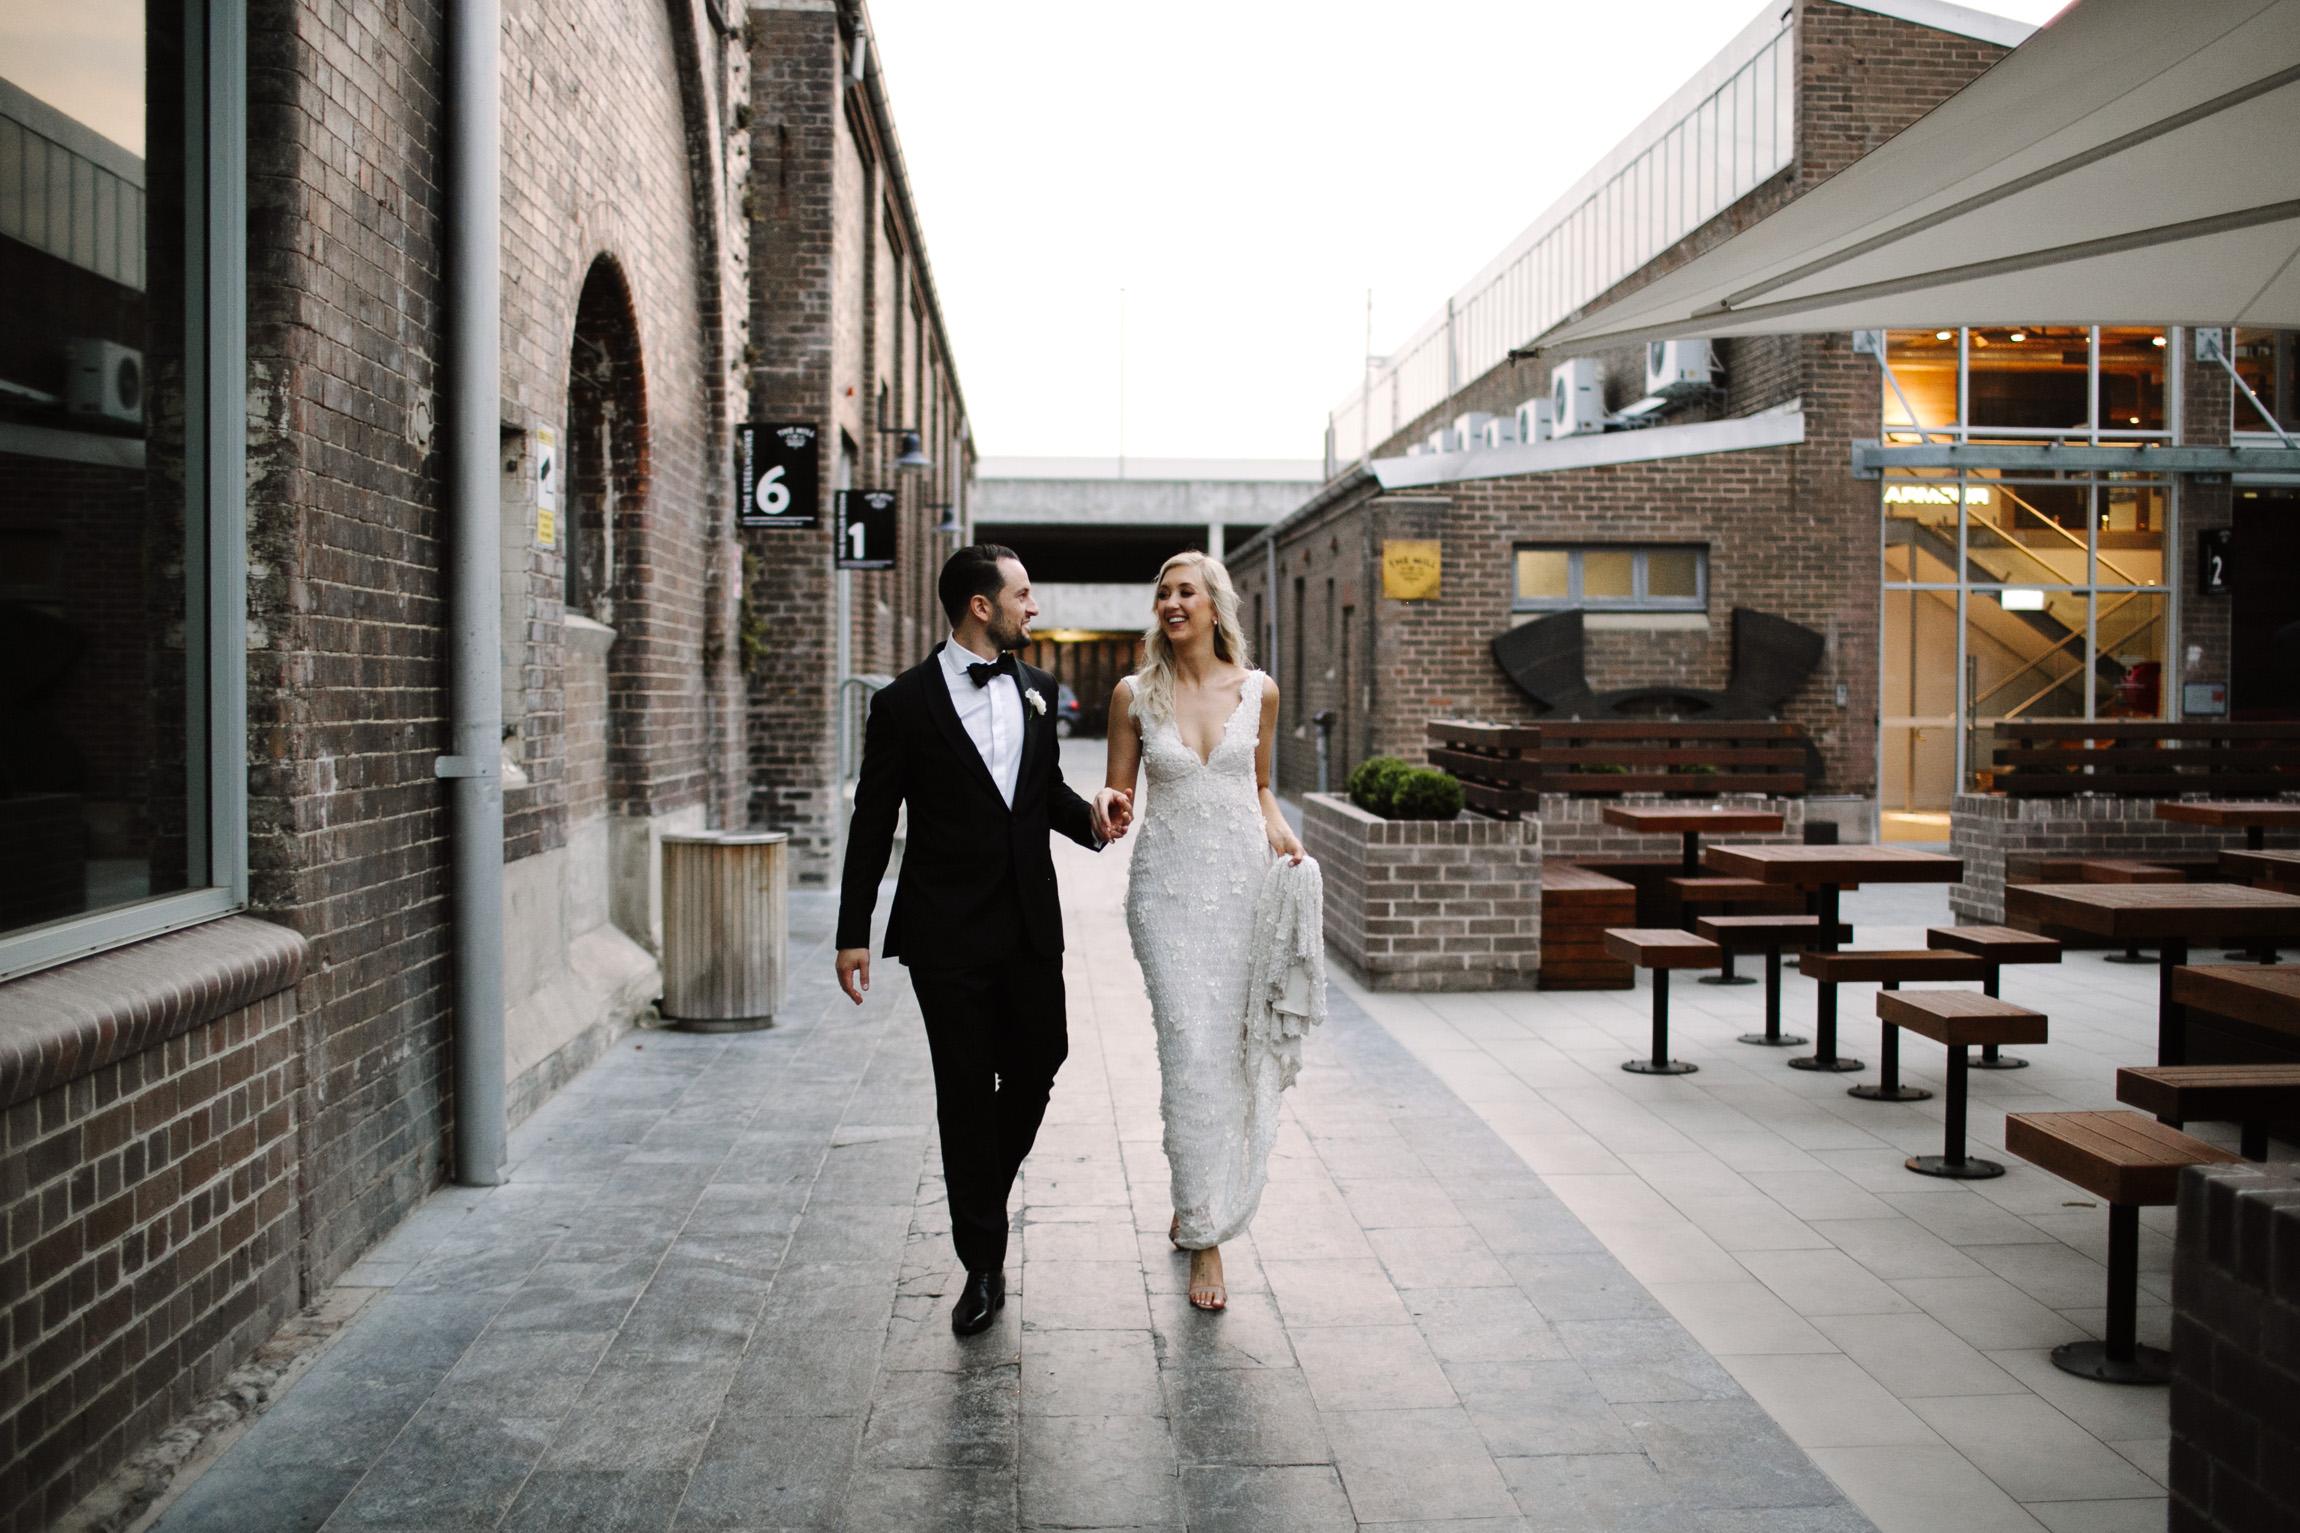 180223_justinaaron_wedding_charlotte_david_h-213.jpg